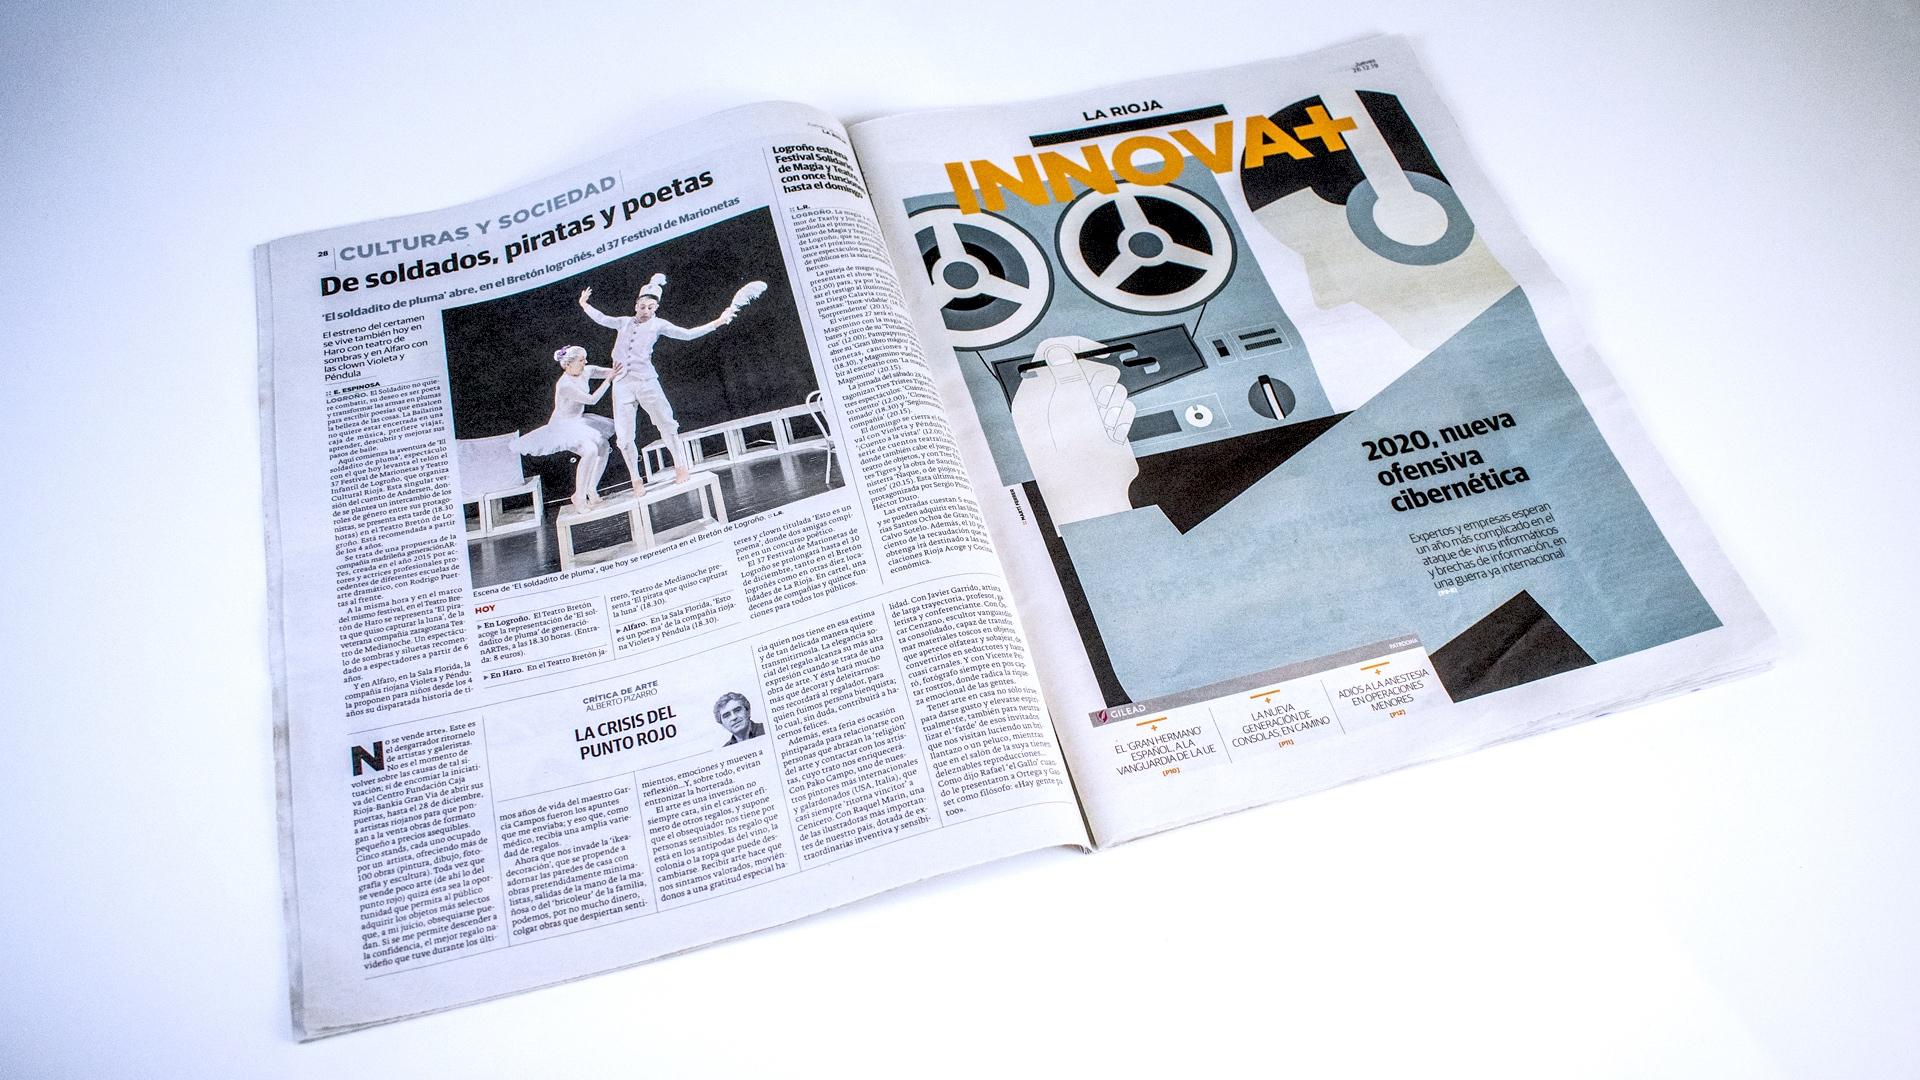 Diario La Rioja. La crisis del punto rojo (Printed edition)